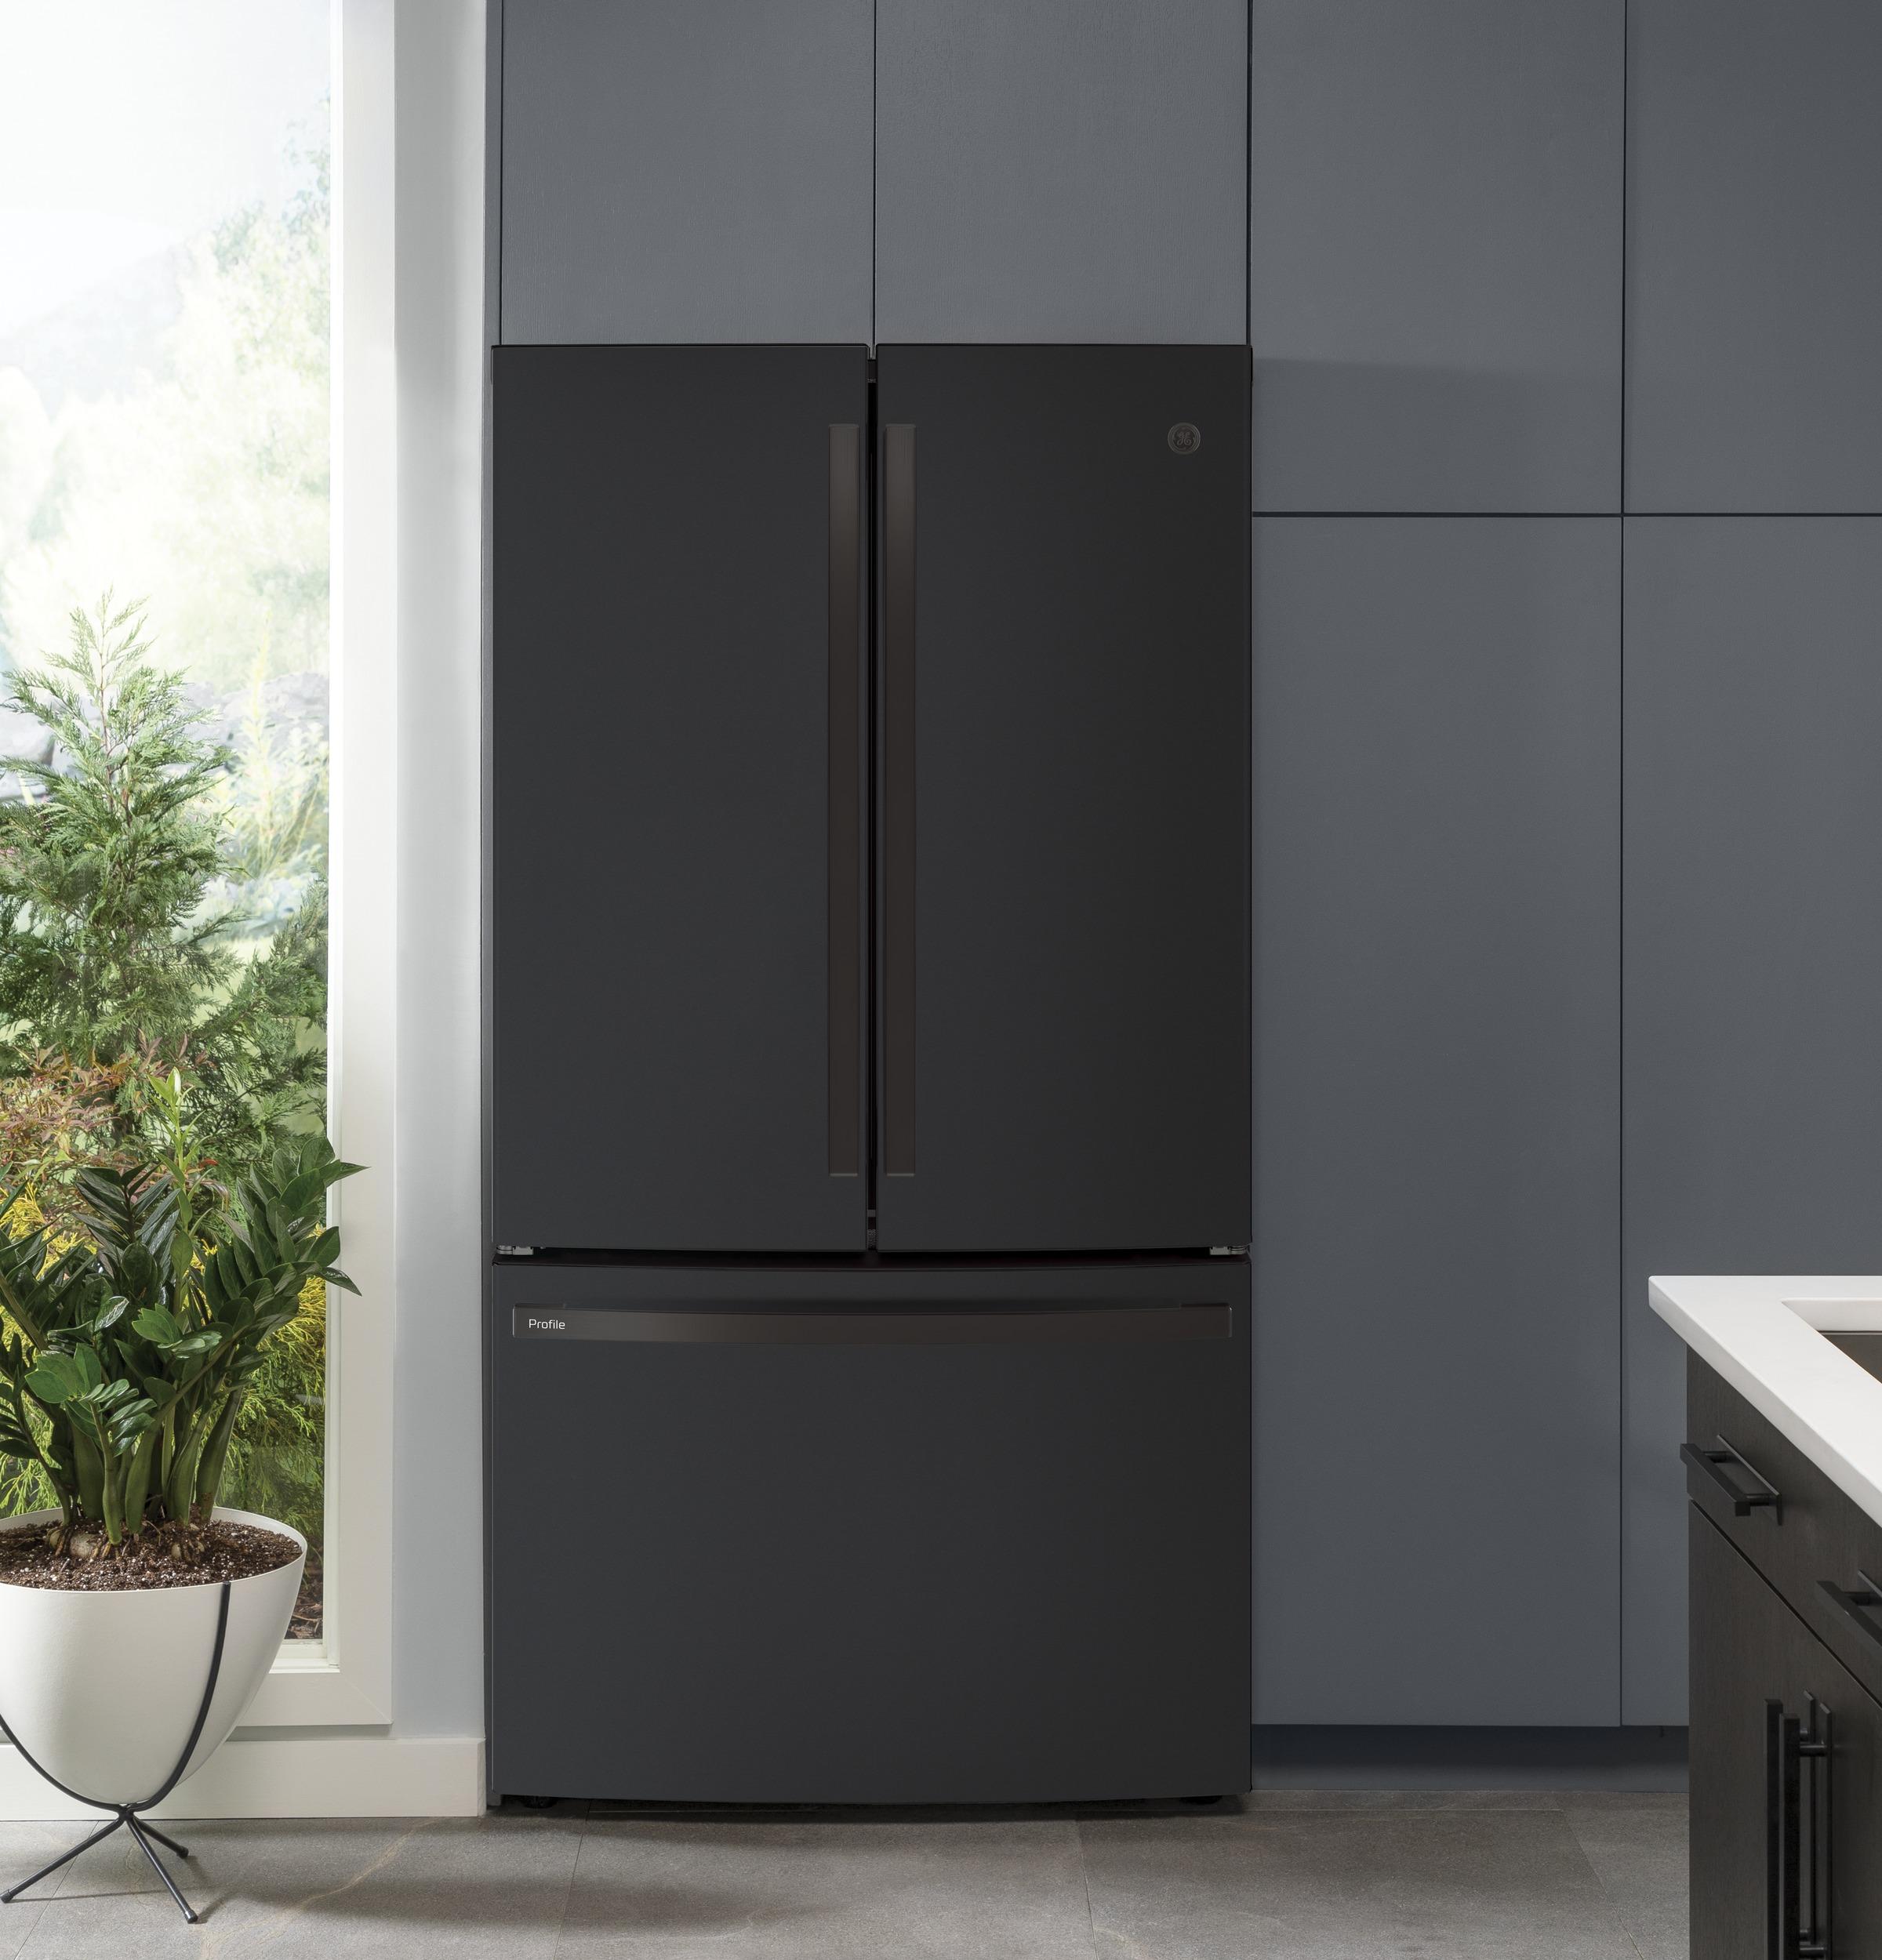 Model: PWE23KELDS   GE Profile GE Profile™ Series ENERGY STAR® 23.1 Cu. Ft. Counter-Depth French-Door Refrigerator